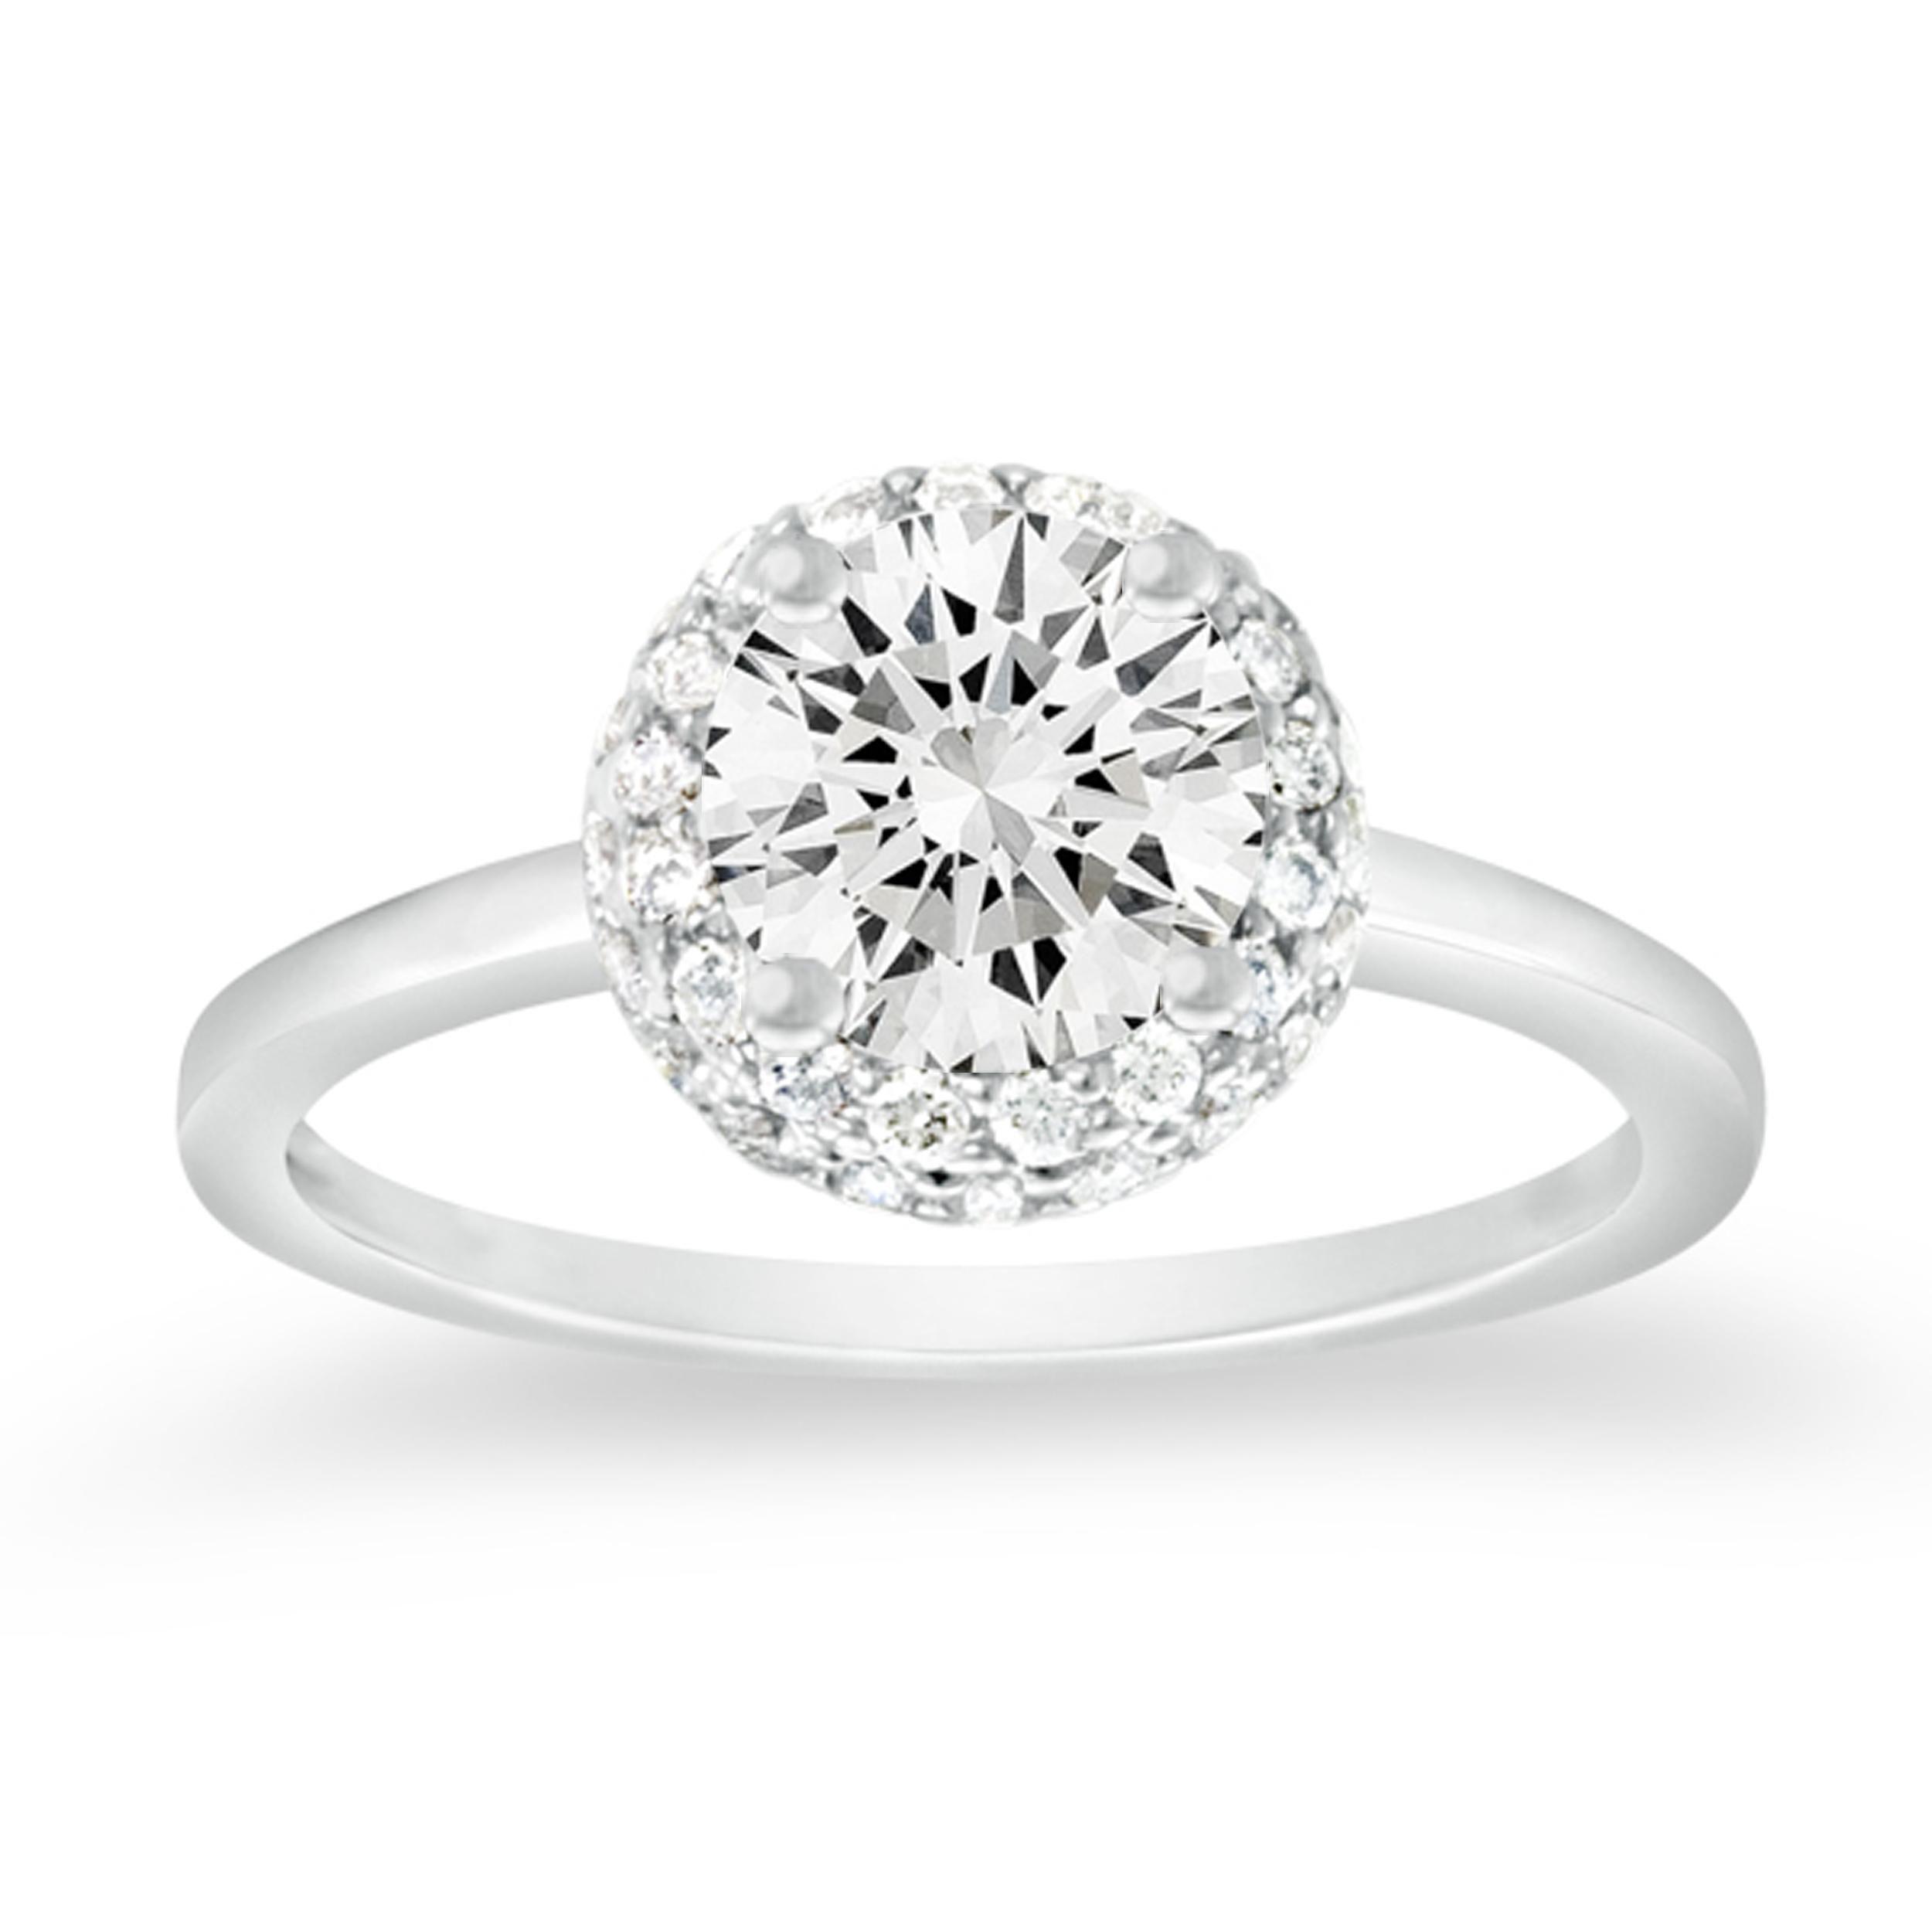 Diamond Engagement Rings Round Halo Flush With Band 17